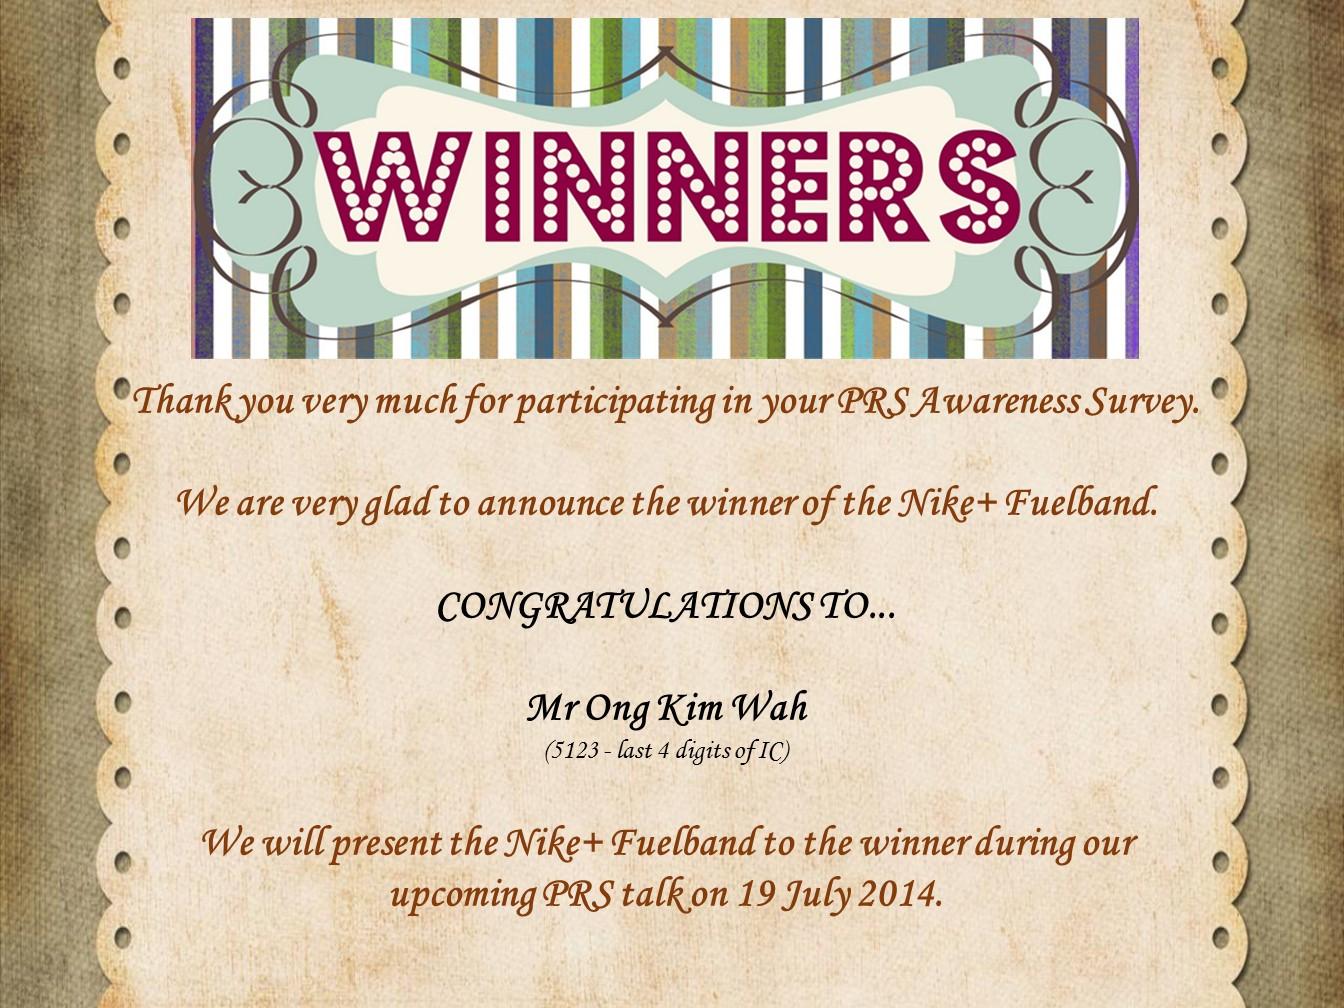 Winner of Nike FuelBand